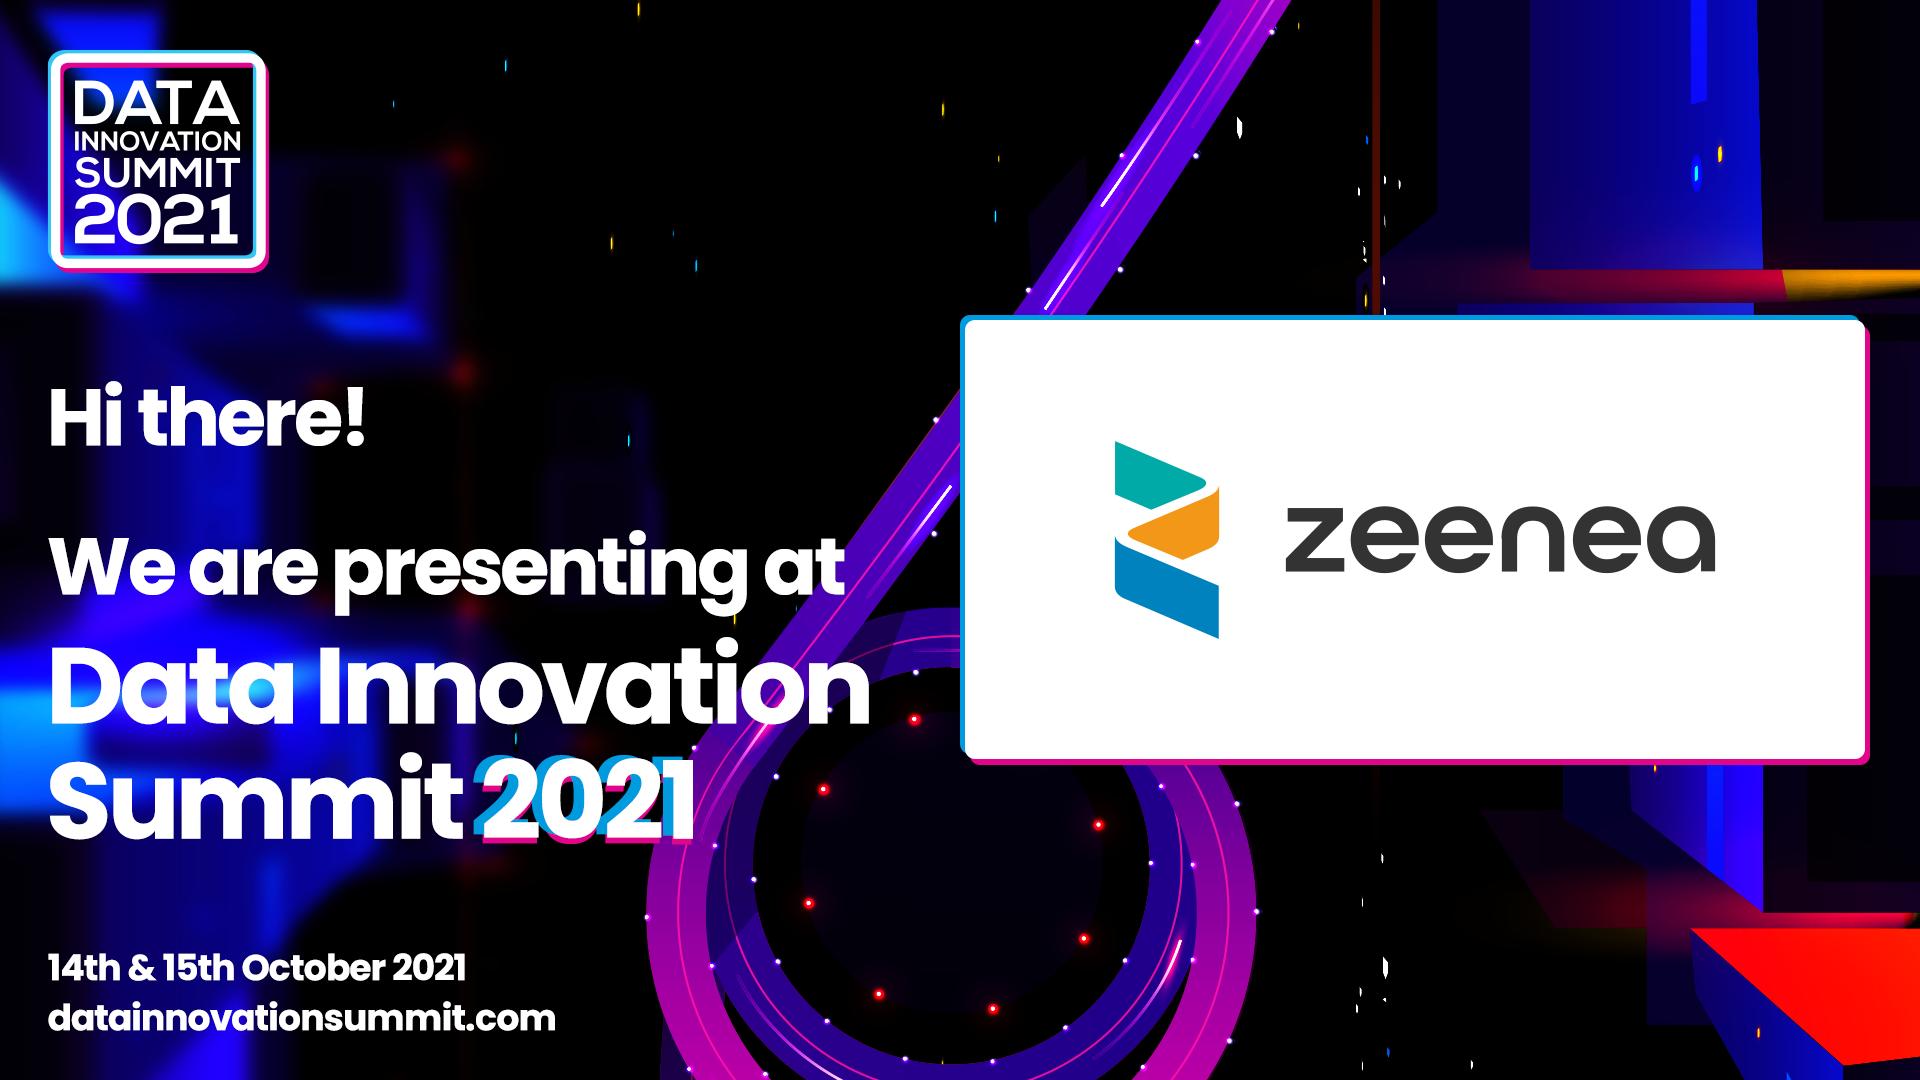 data-innovation-summit-stockholm-2021